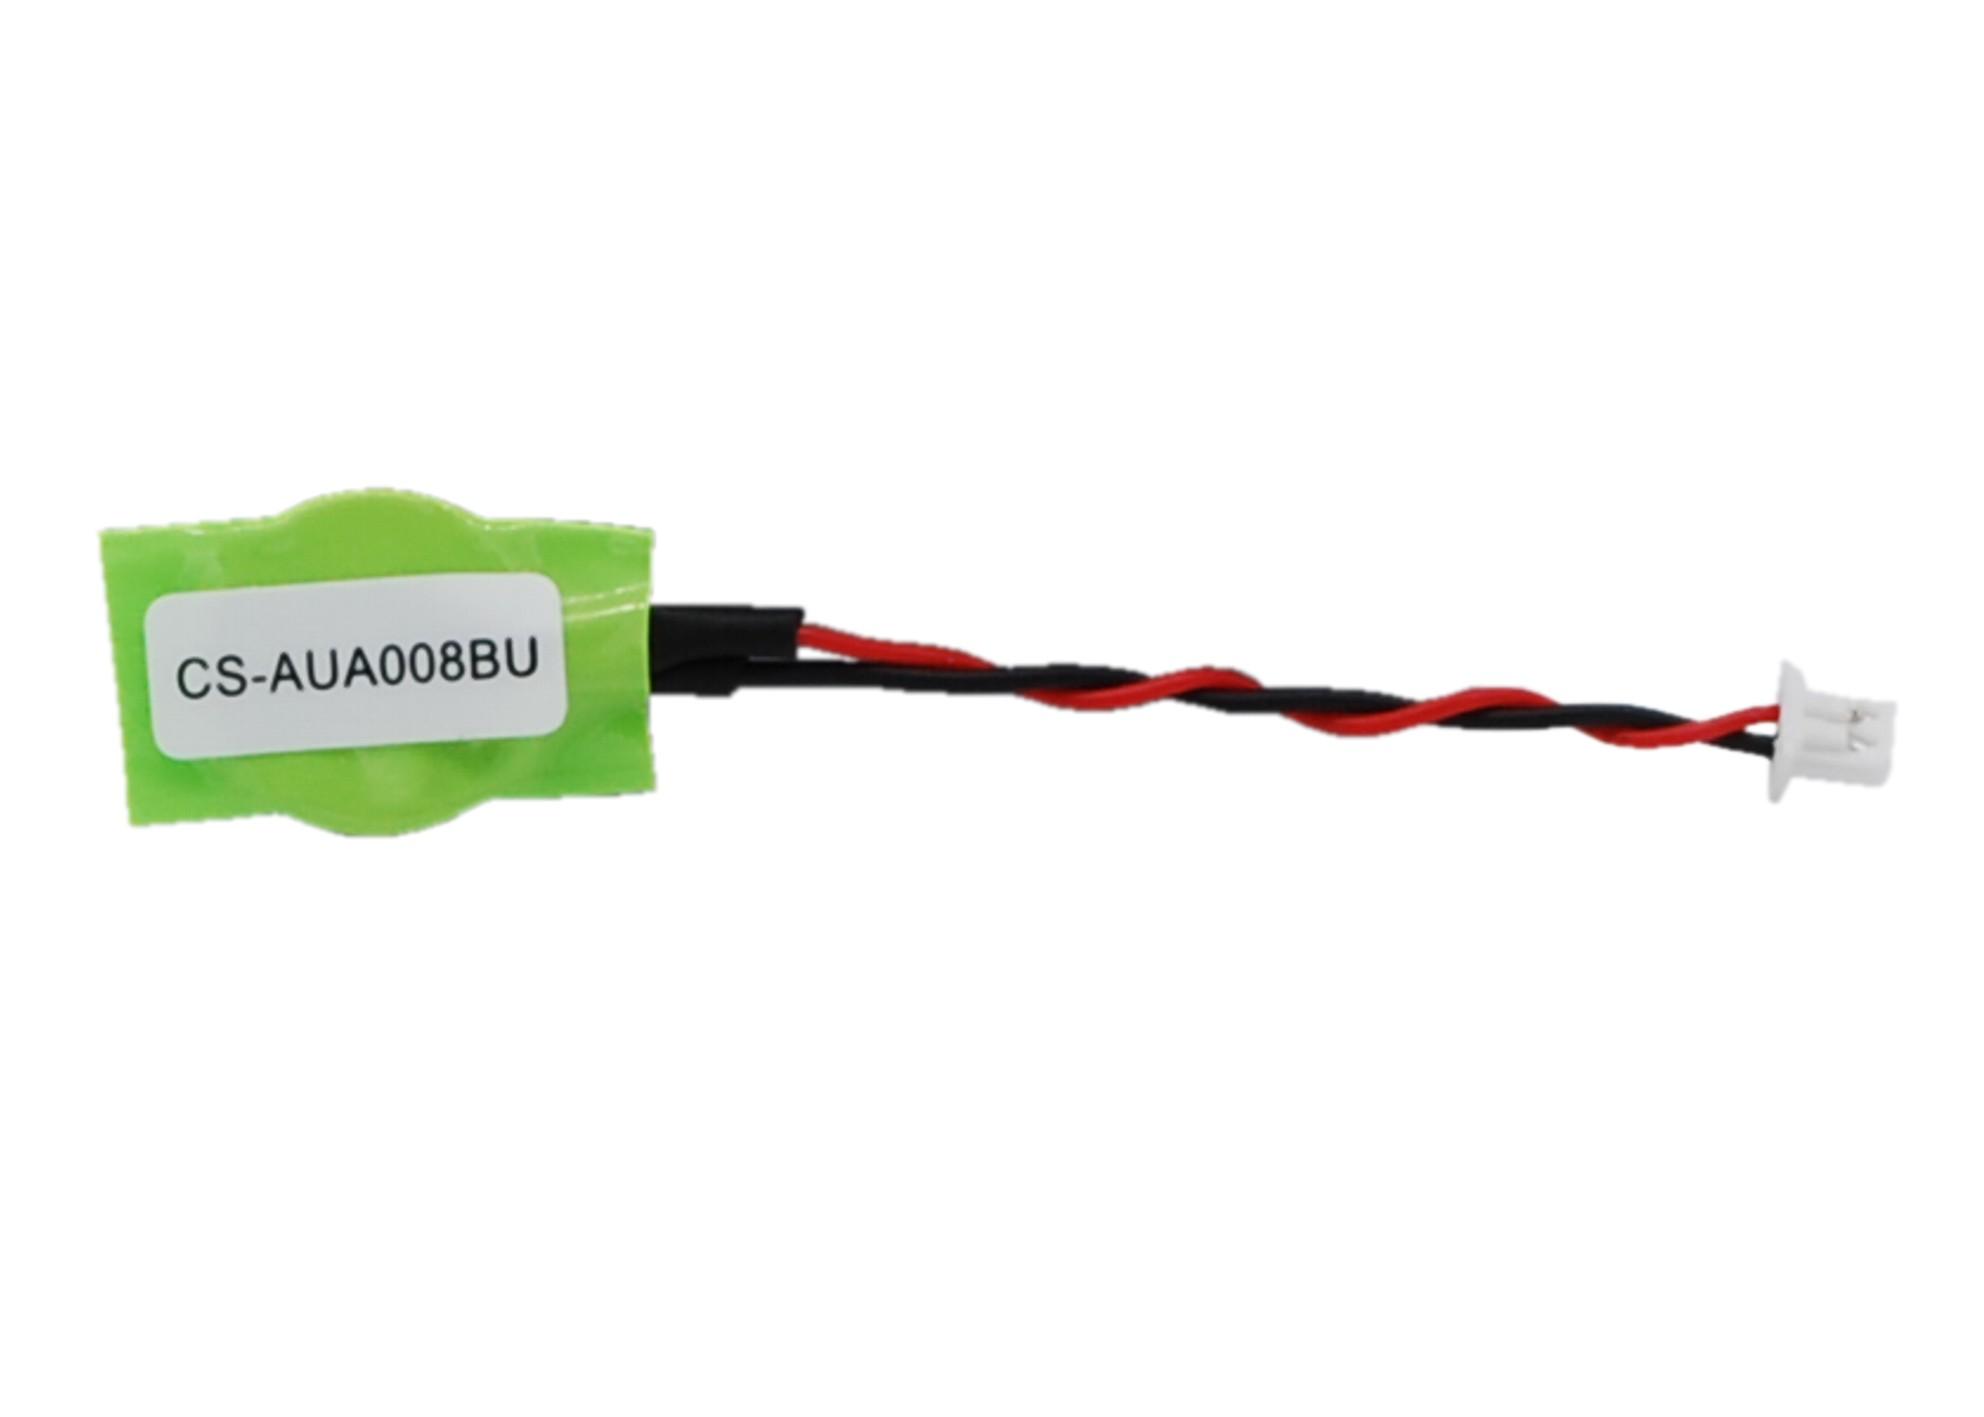 Cameron Sino baterie cmos pro ASUS Eee PC 1005HA-VU1X 3V Li-ion 40mAh zelená - neoriginální